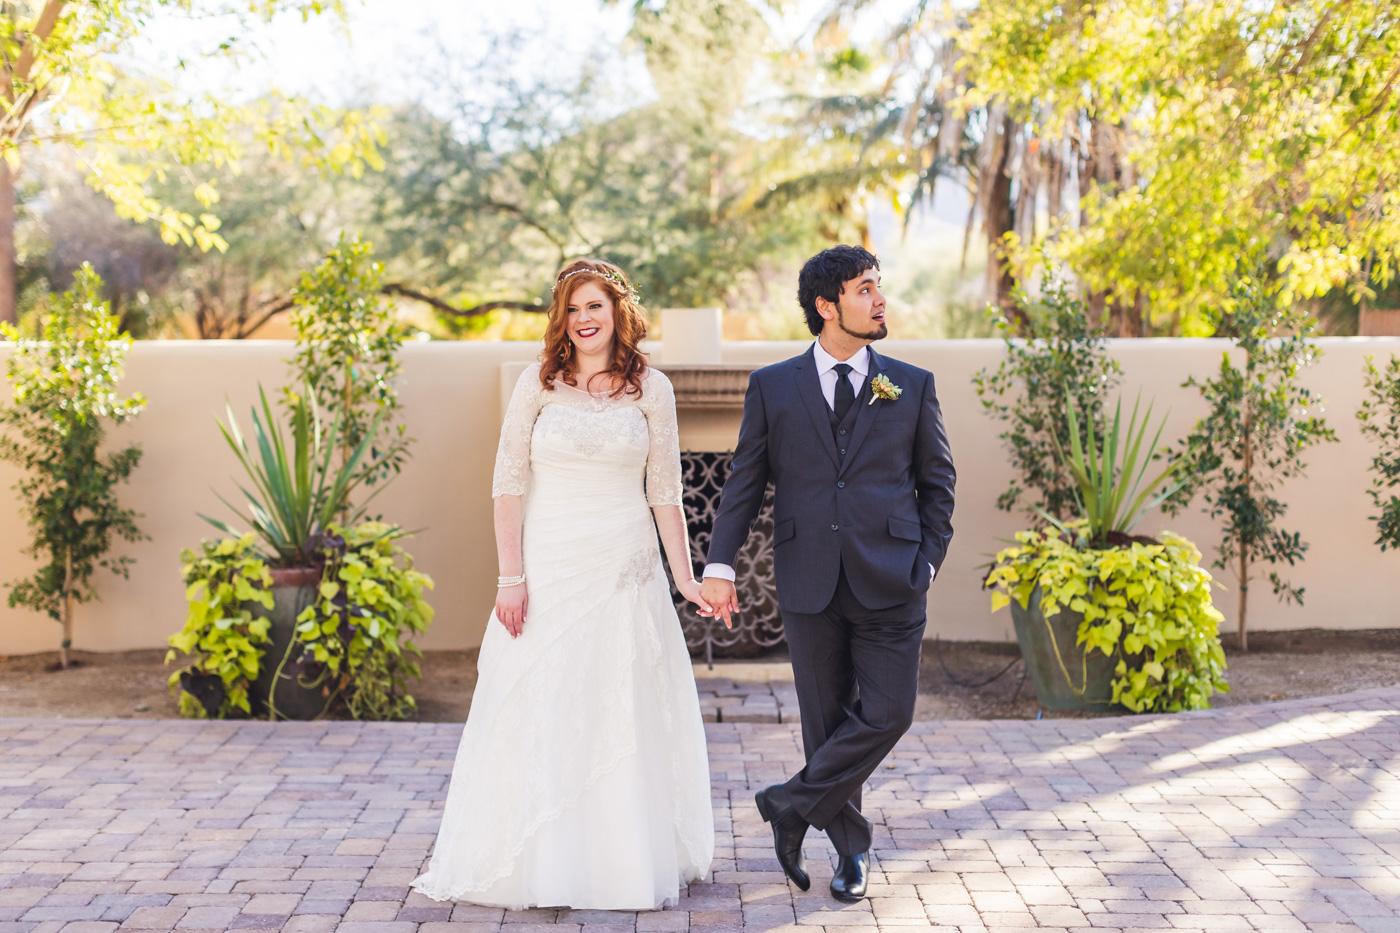 bride-and-groom-portrait-secret-garden-event-center